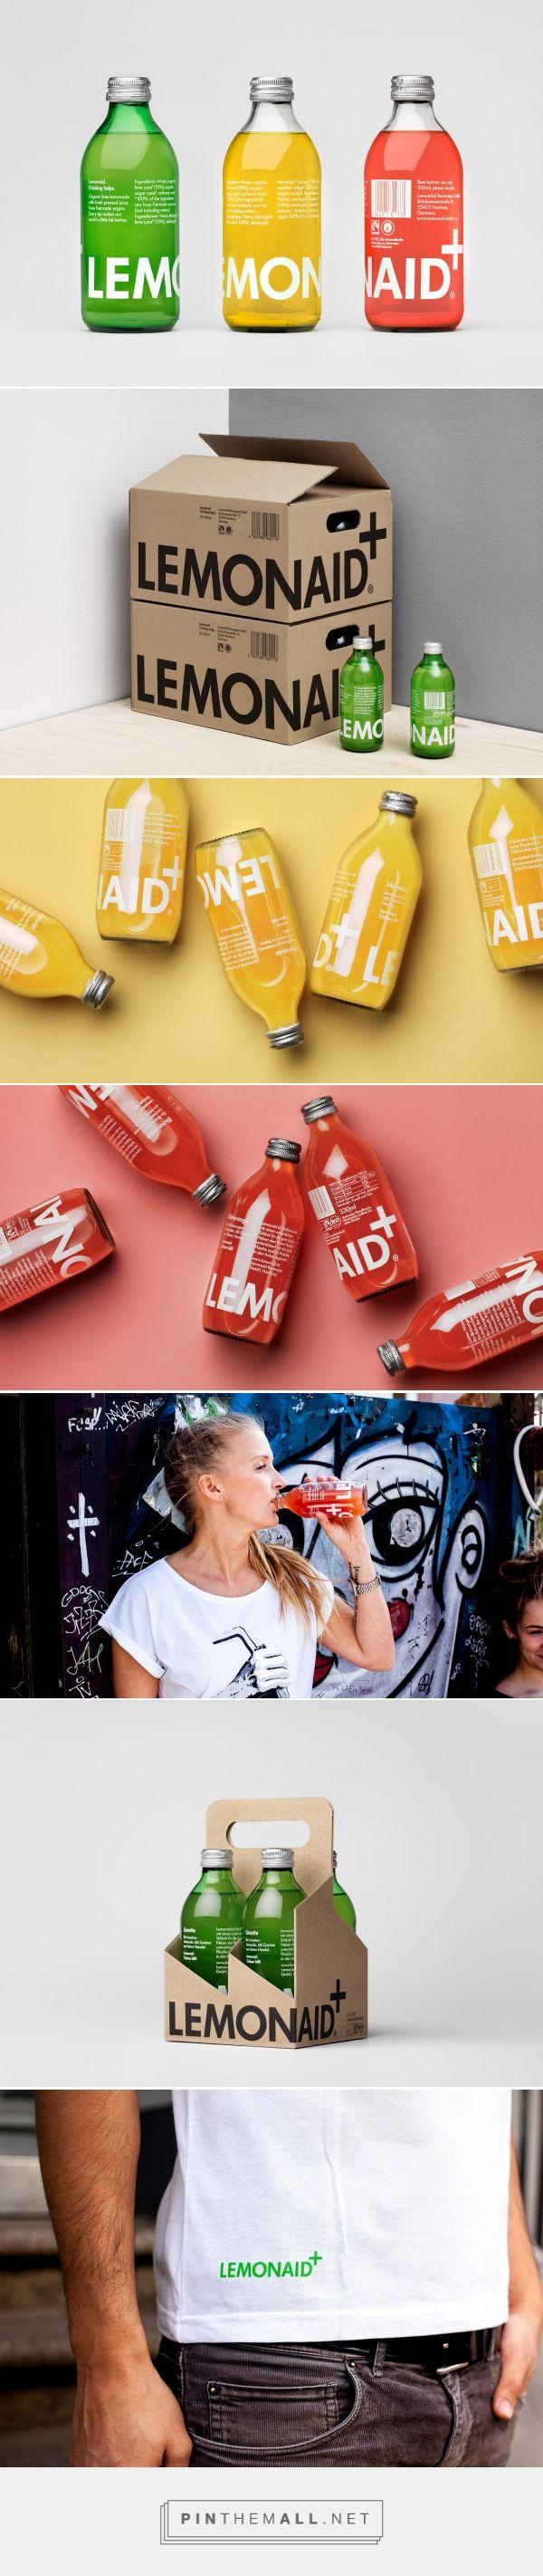 Lemonaid Brand Beverage Packaging by The Studio | Fivestar Branding Agency – Design and Branding Agency & Inspiration Gallery